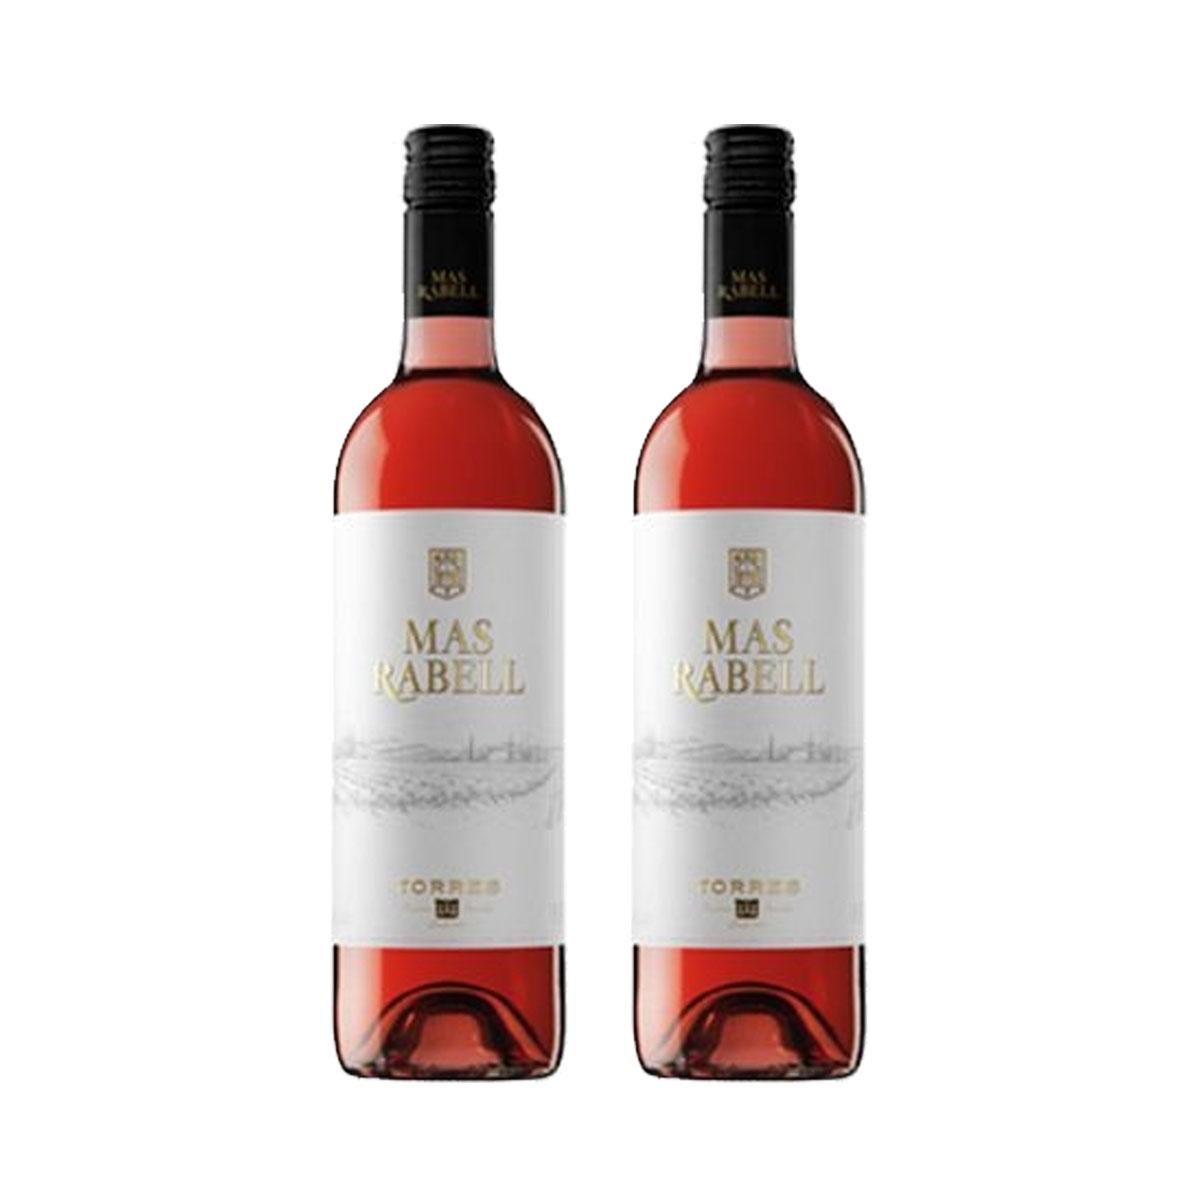 Kit 2x Vinho Rose Espanhol Torres Mas Rabell 750ml 2017